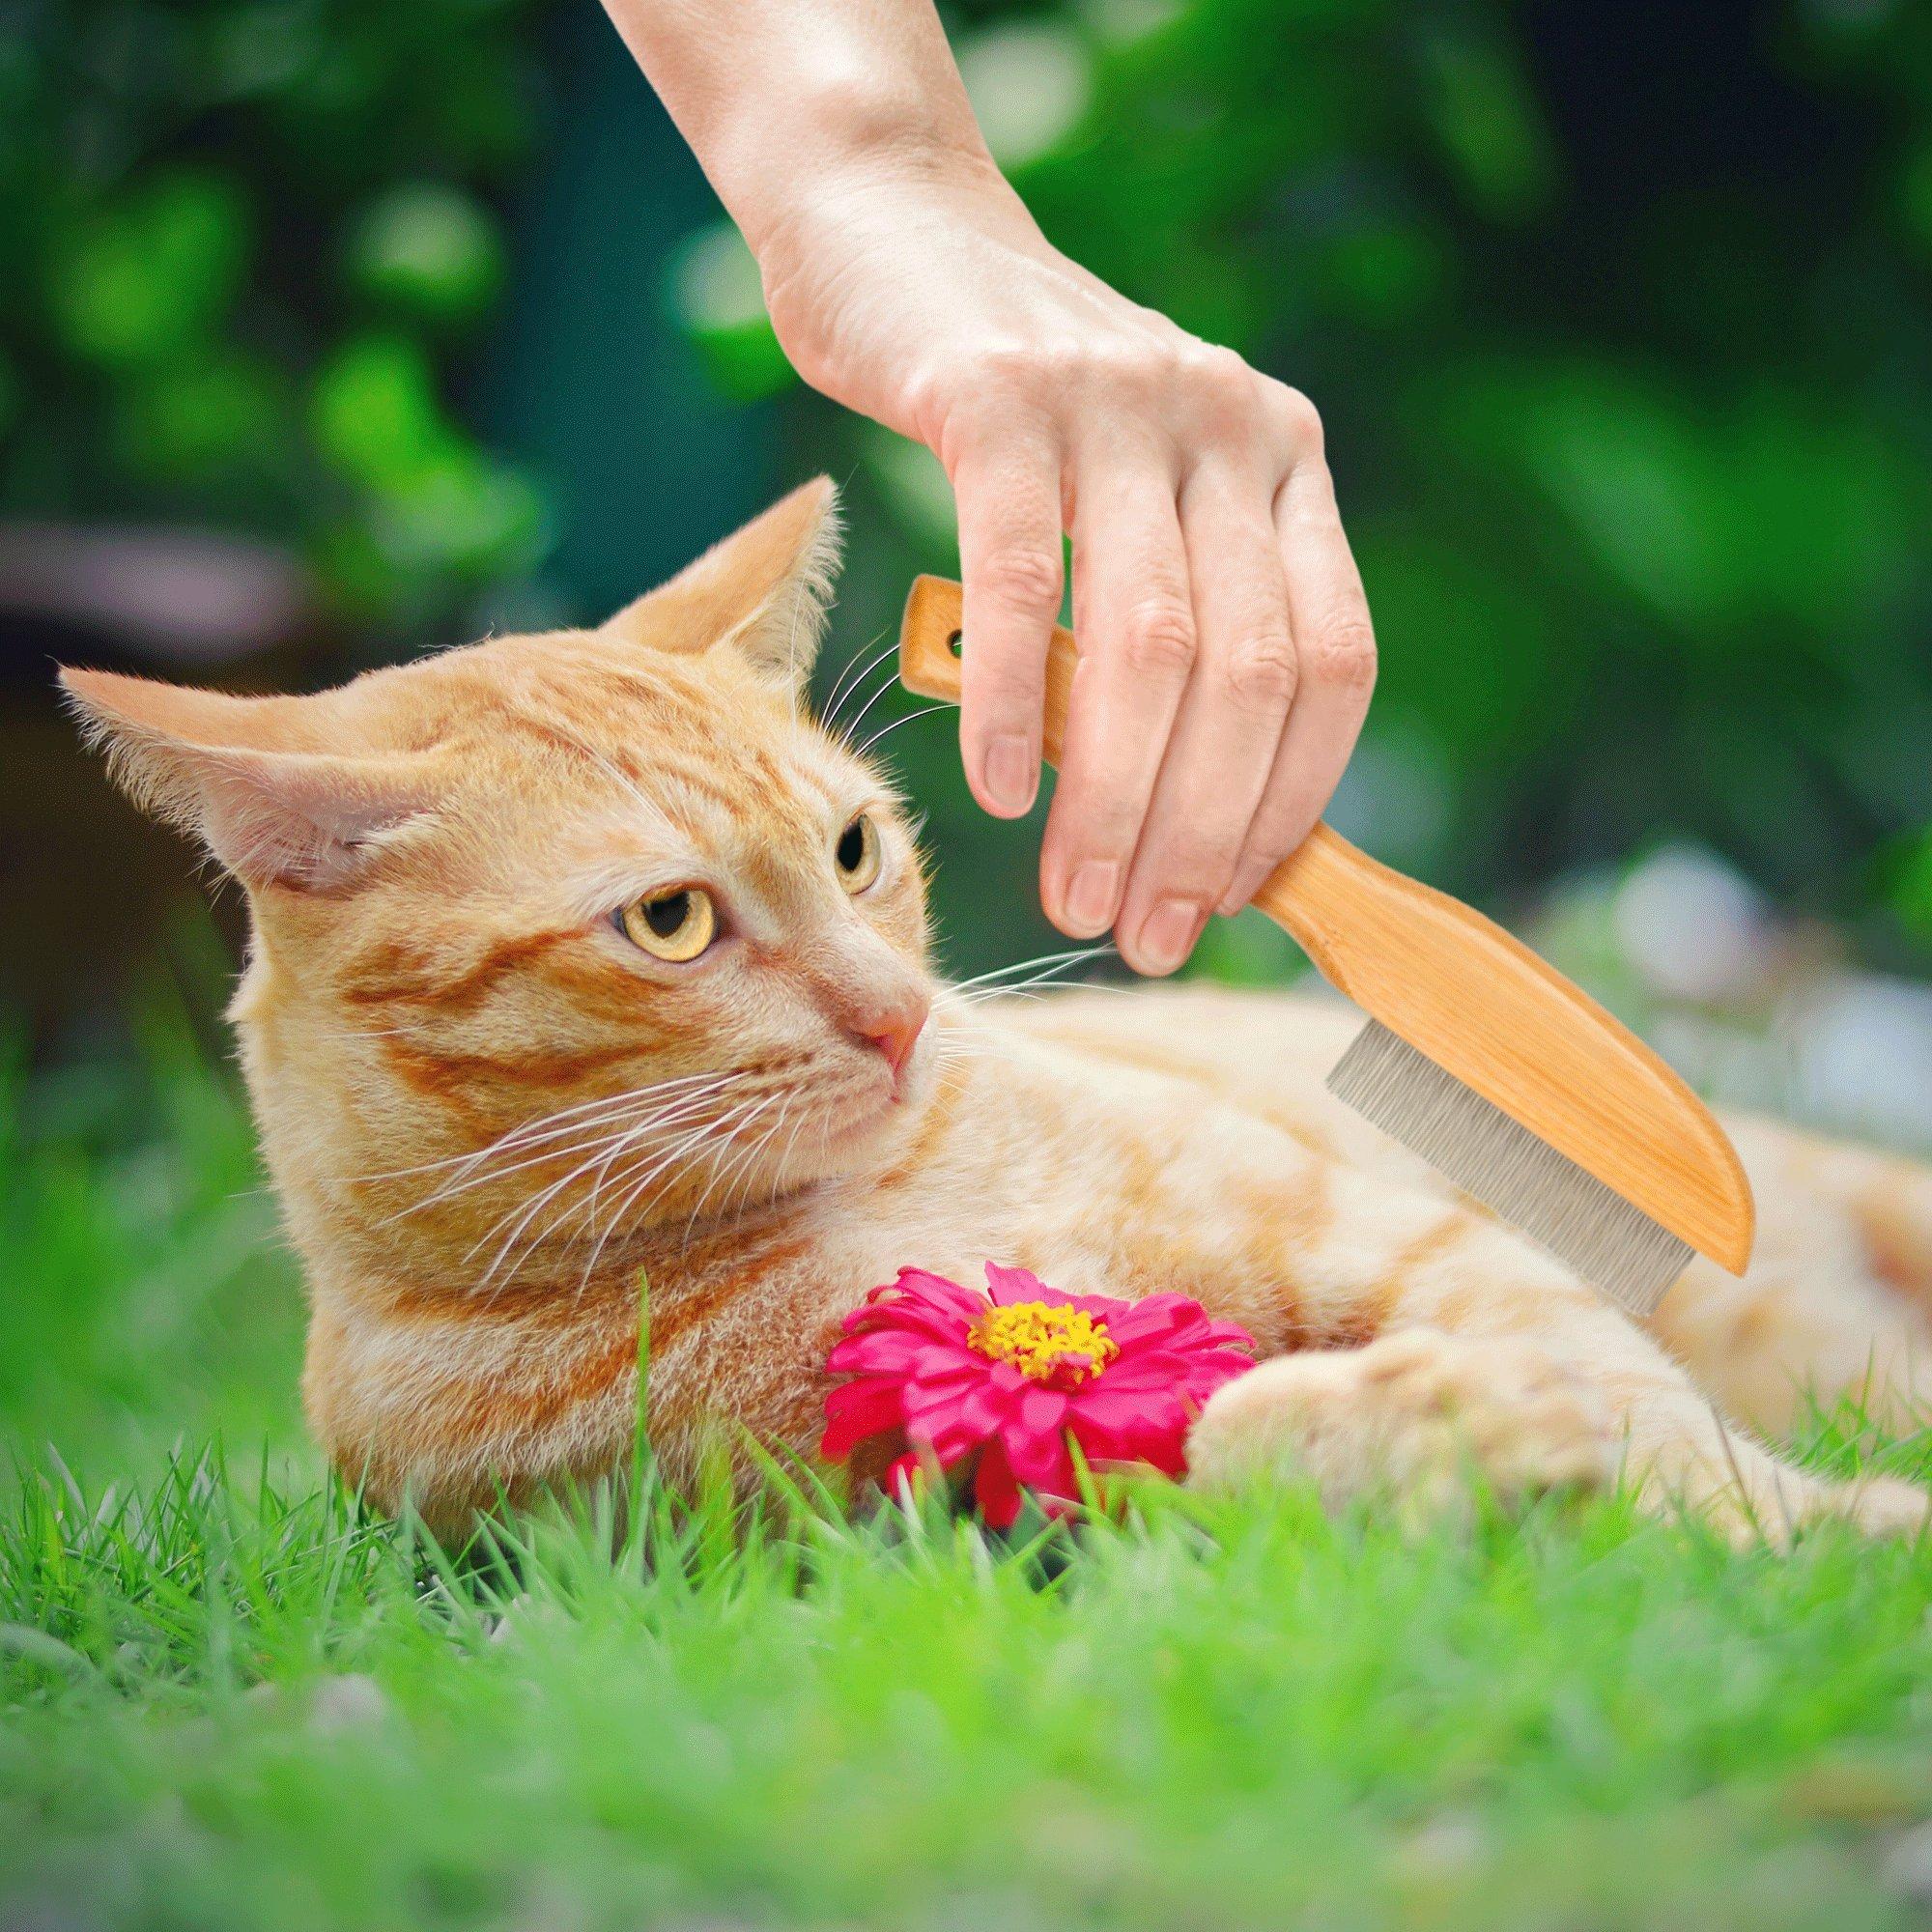 Vet's Best Bamboo Flea Comb for Cats by Vet's Best (Image #3)